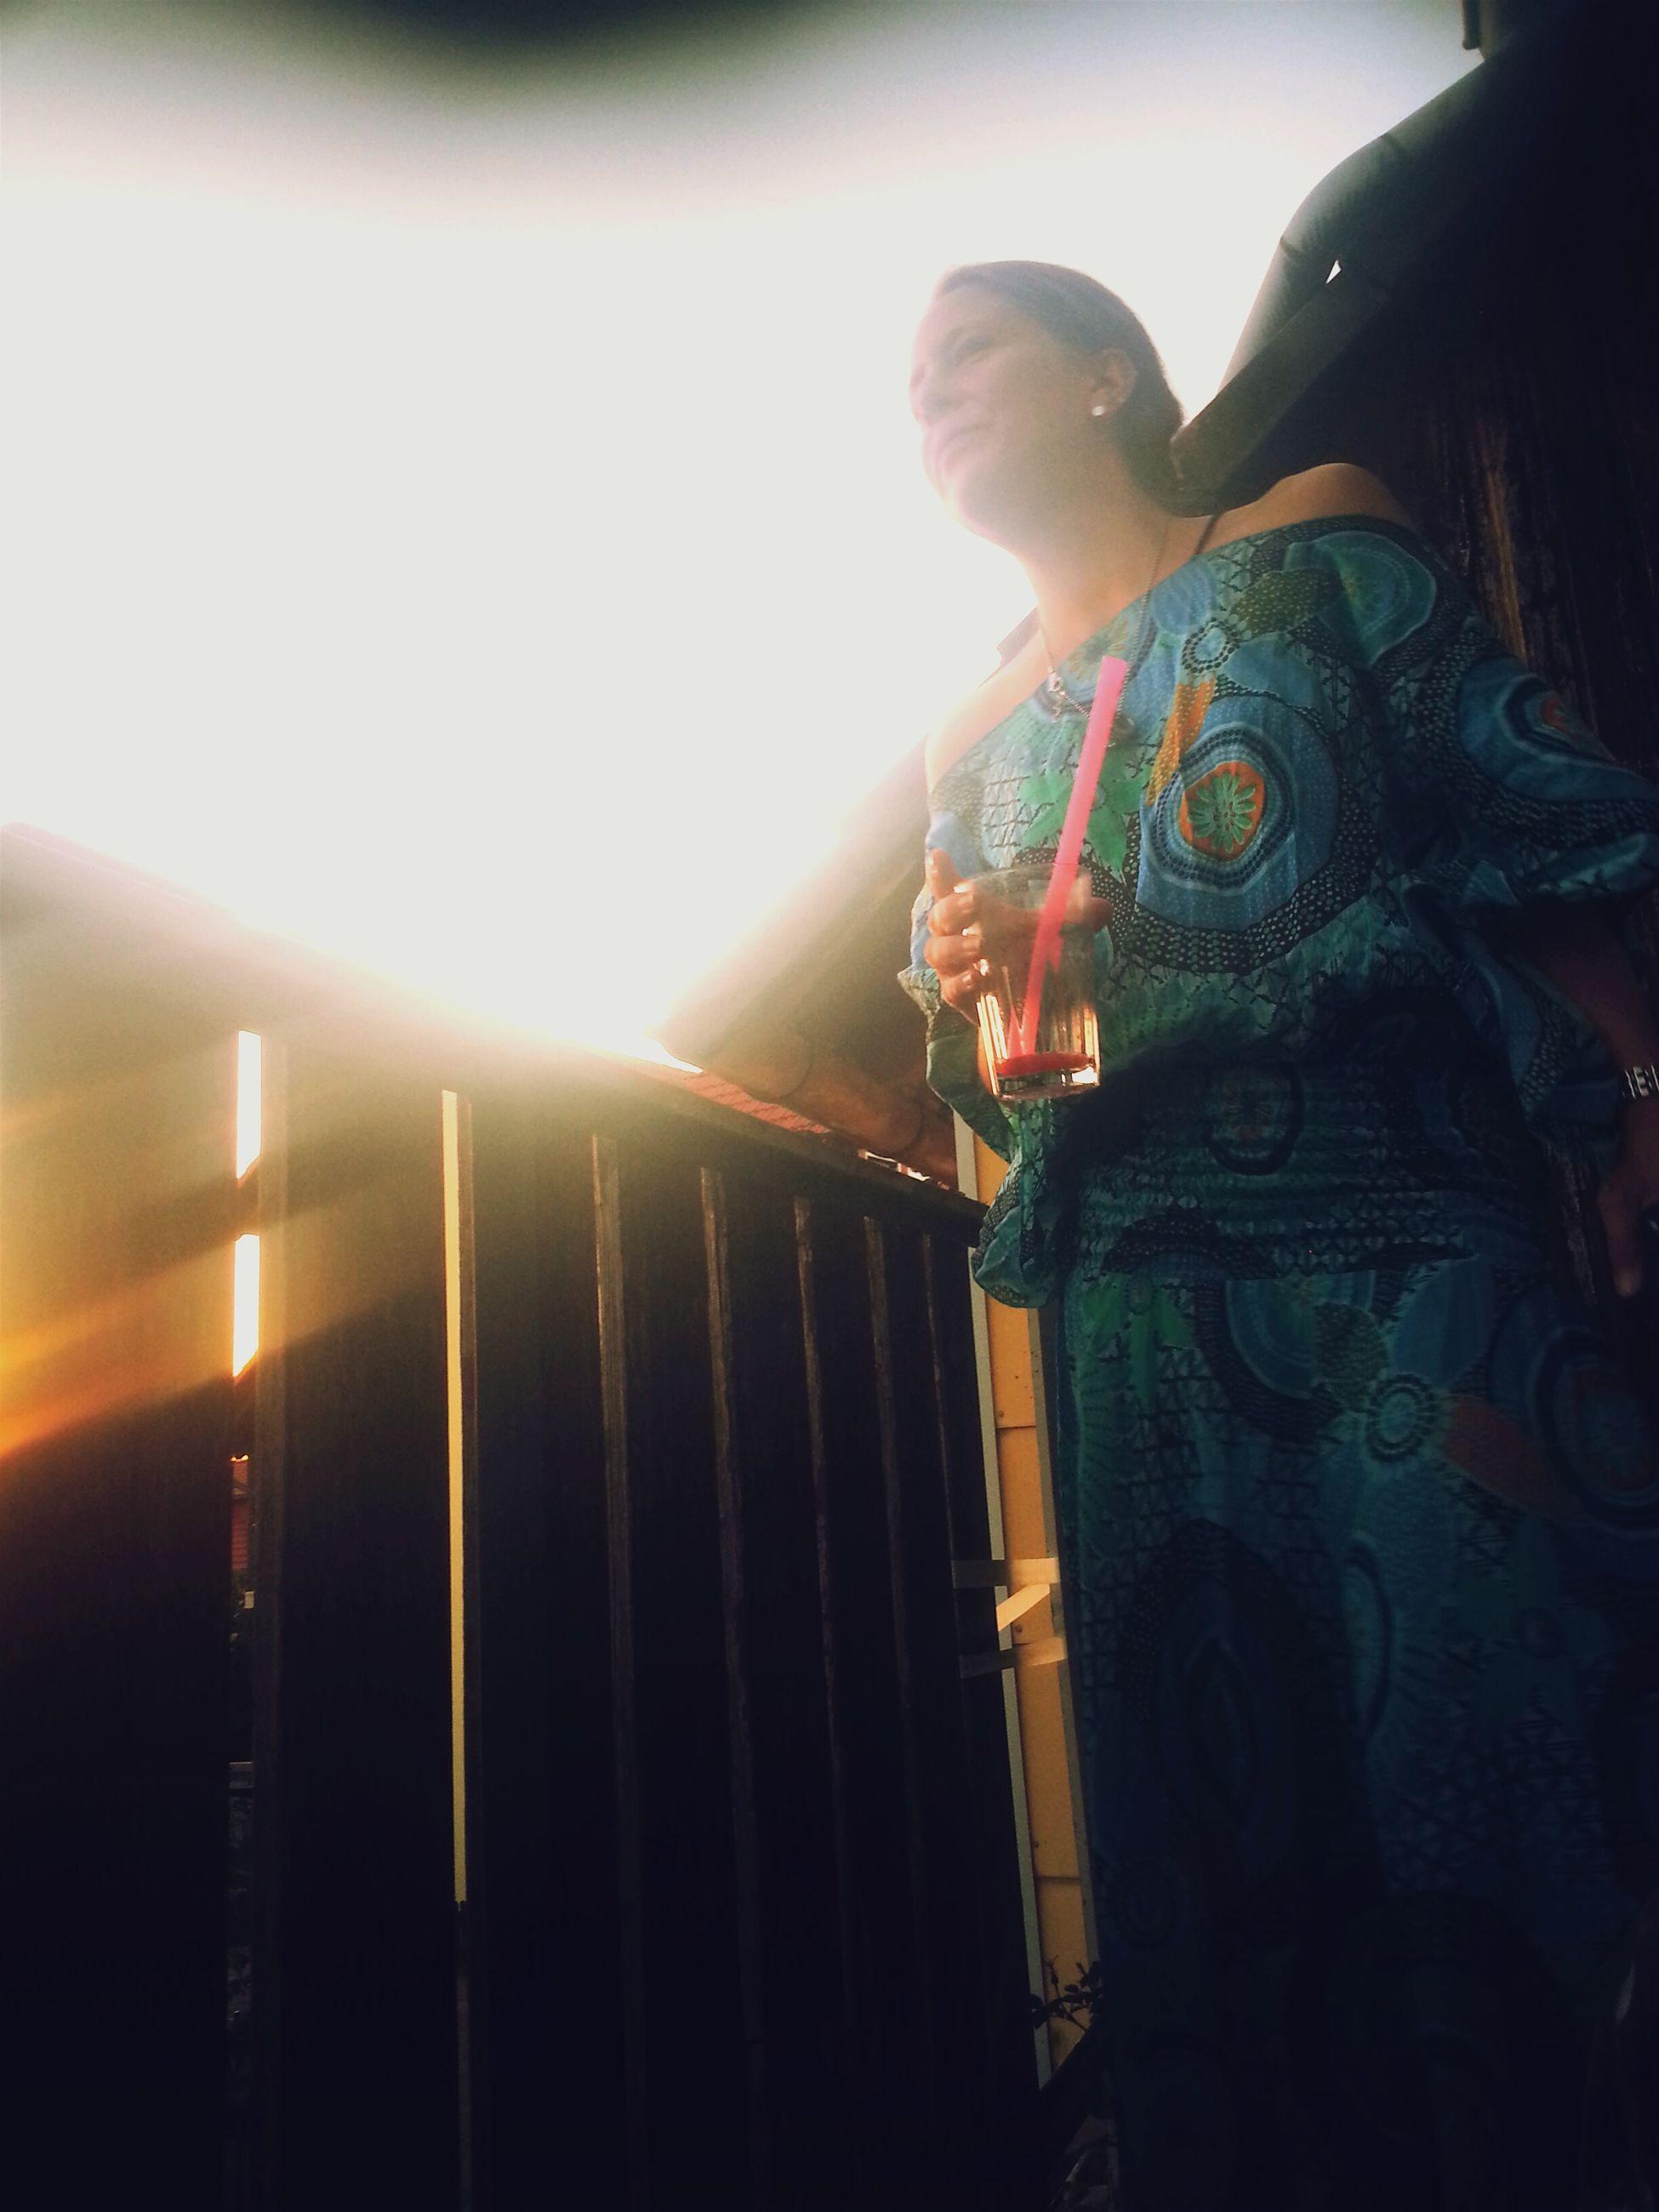 lifestyles, leisure activity, lens flare, rear view, illuminated, men, standing, casual clothing, sun, full length, sunbeam, sunlight, night, three quarter length, warm clothing, person, lighting equipment, indoors